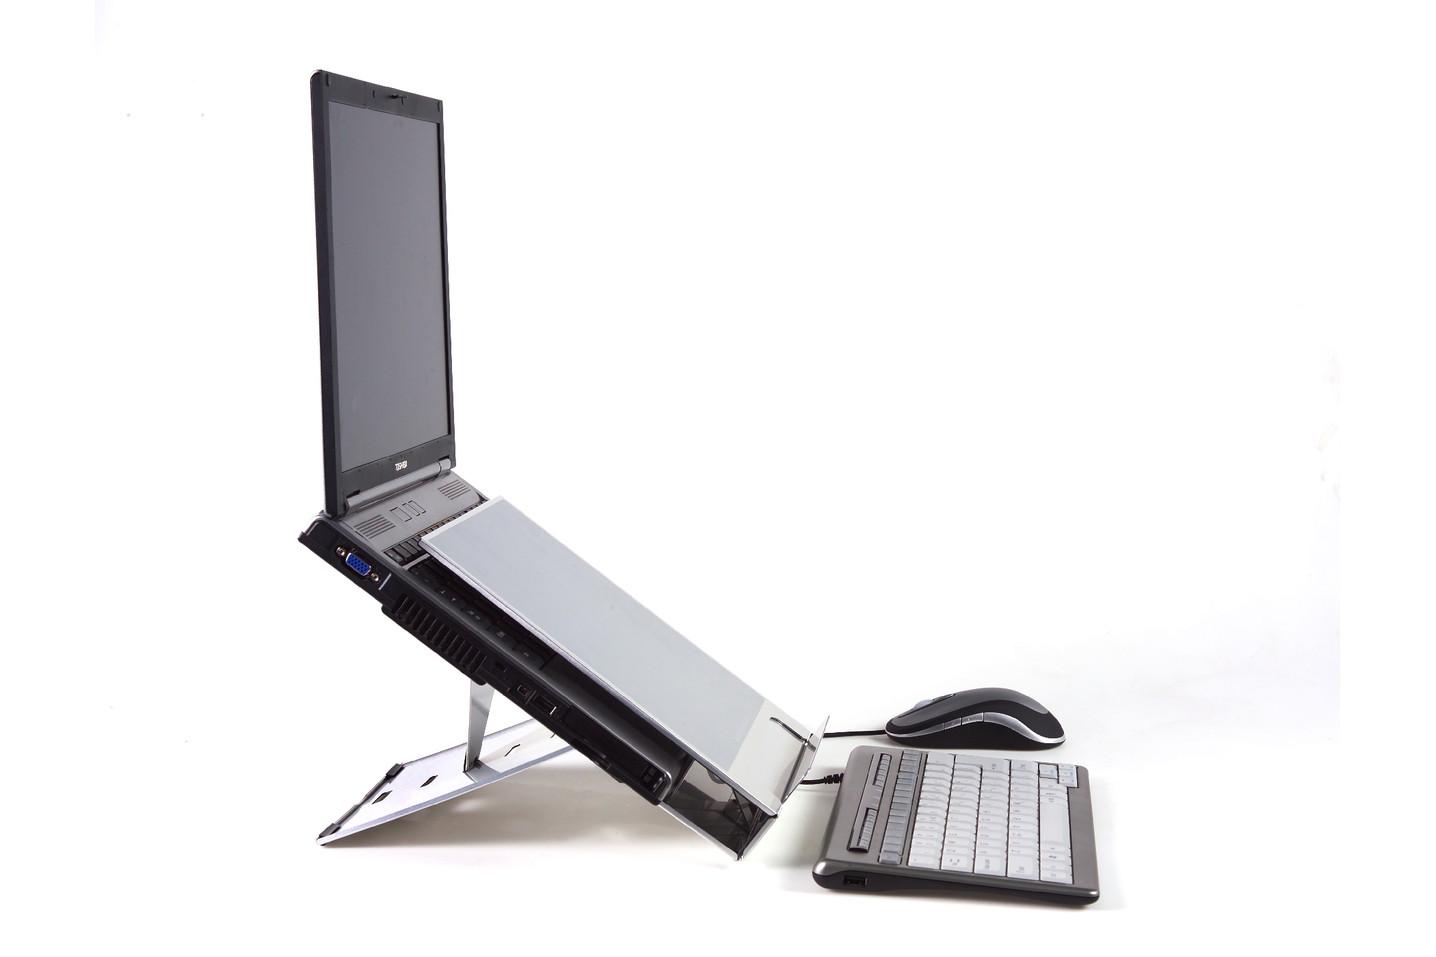 ergo-q-260-notebook-stand-1395147965.jpg